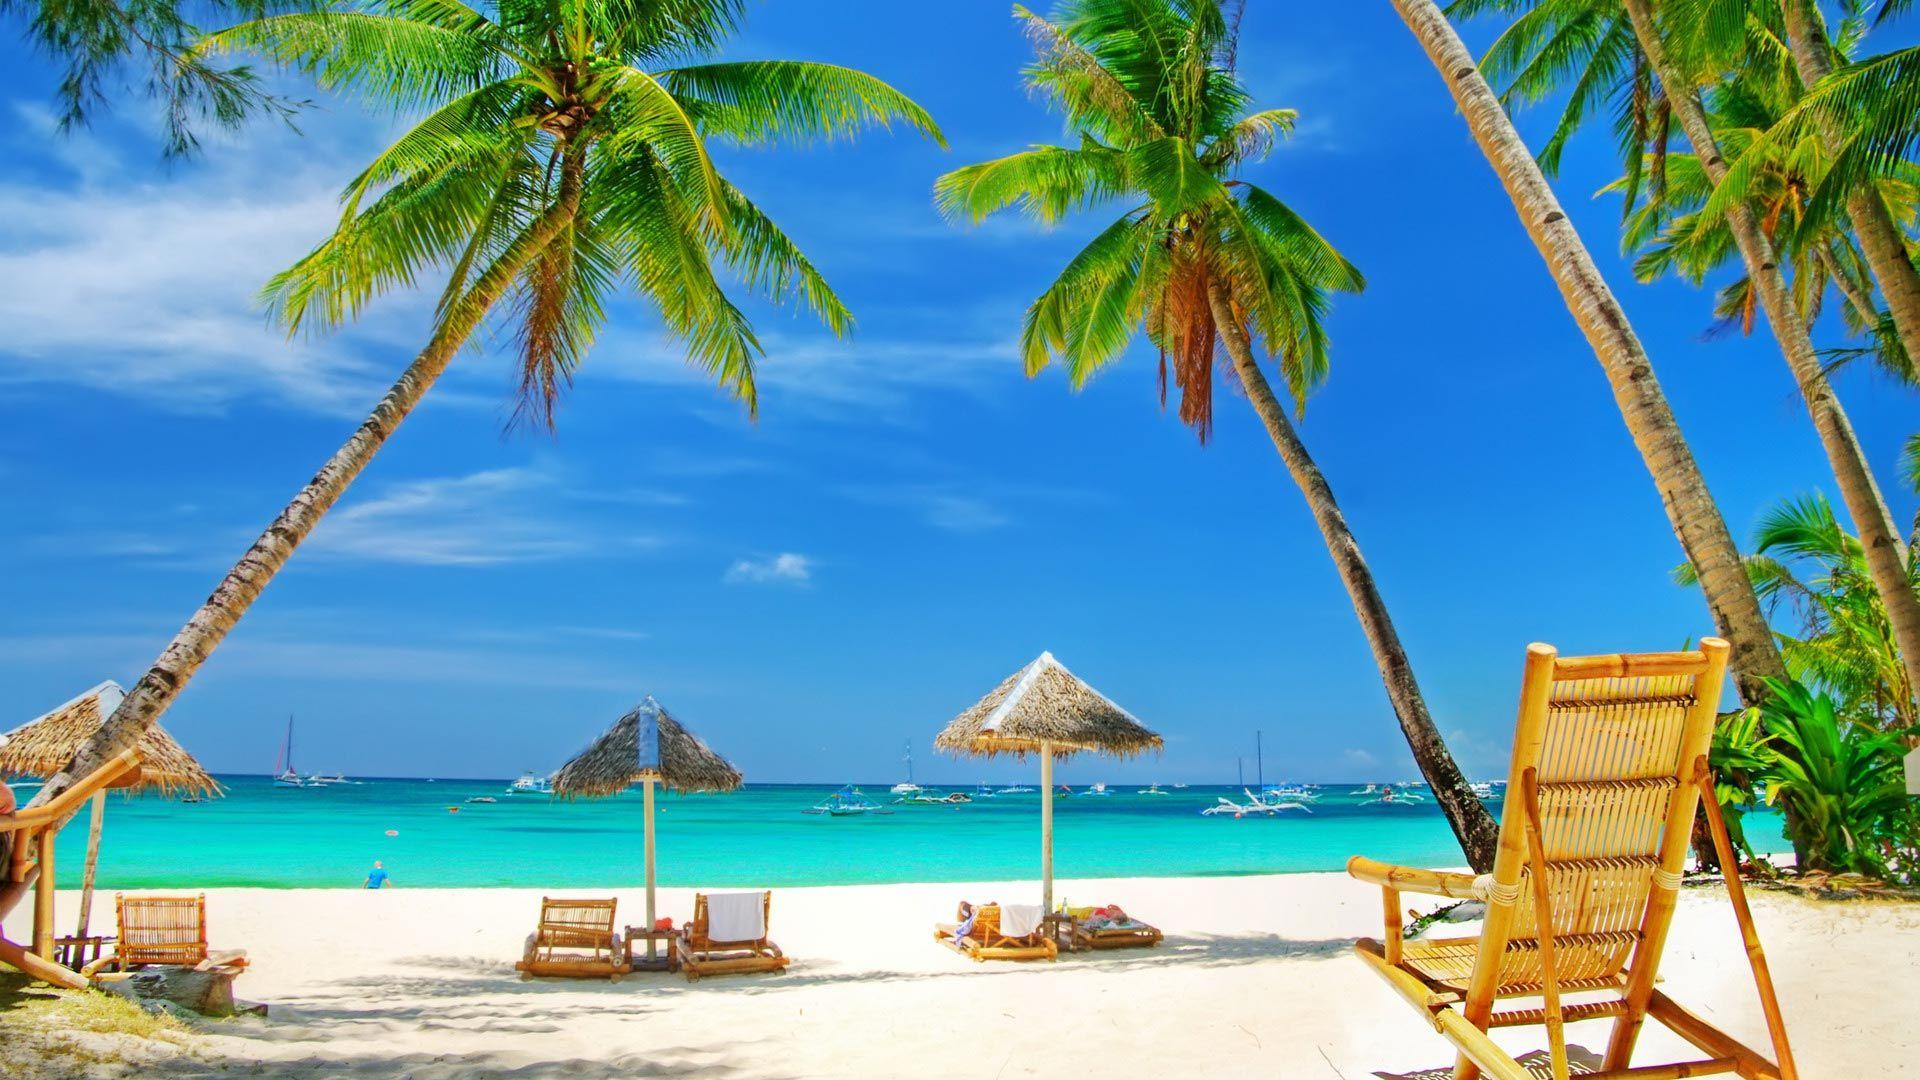 1920x1080 Beach Sea Blue Sky Summer HD Wallpapers 1080p | Beach HD Wallpapers in 2019 | Beach ...